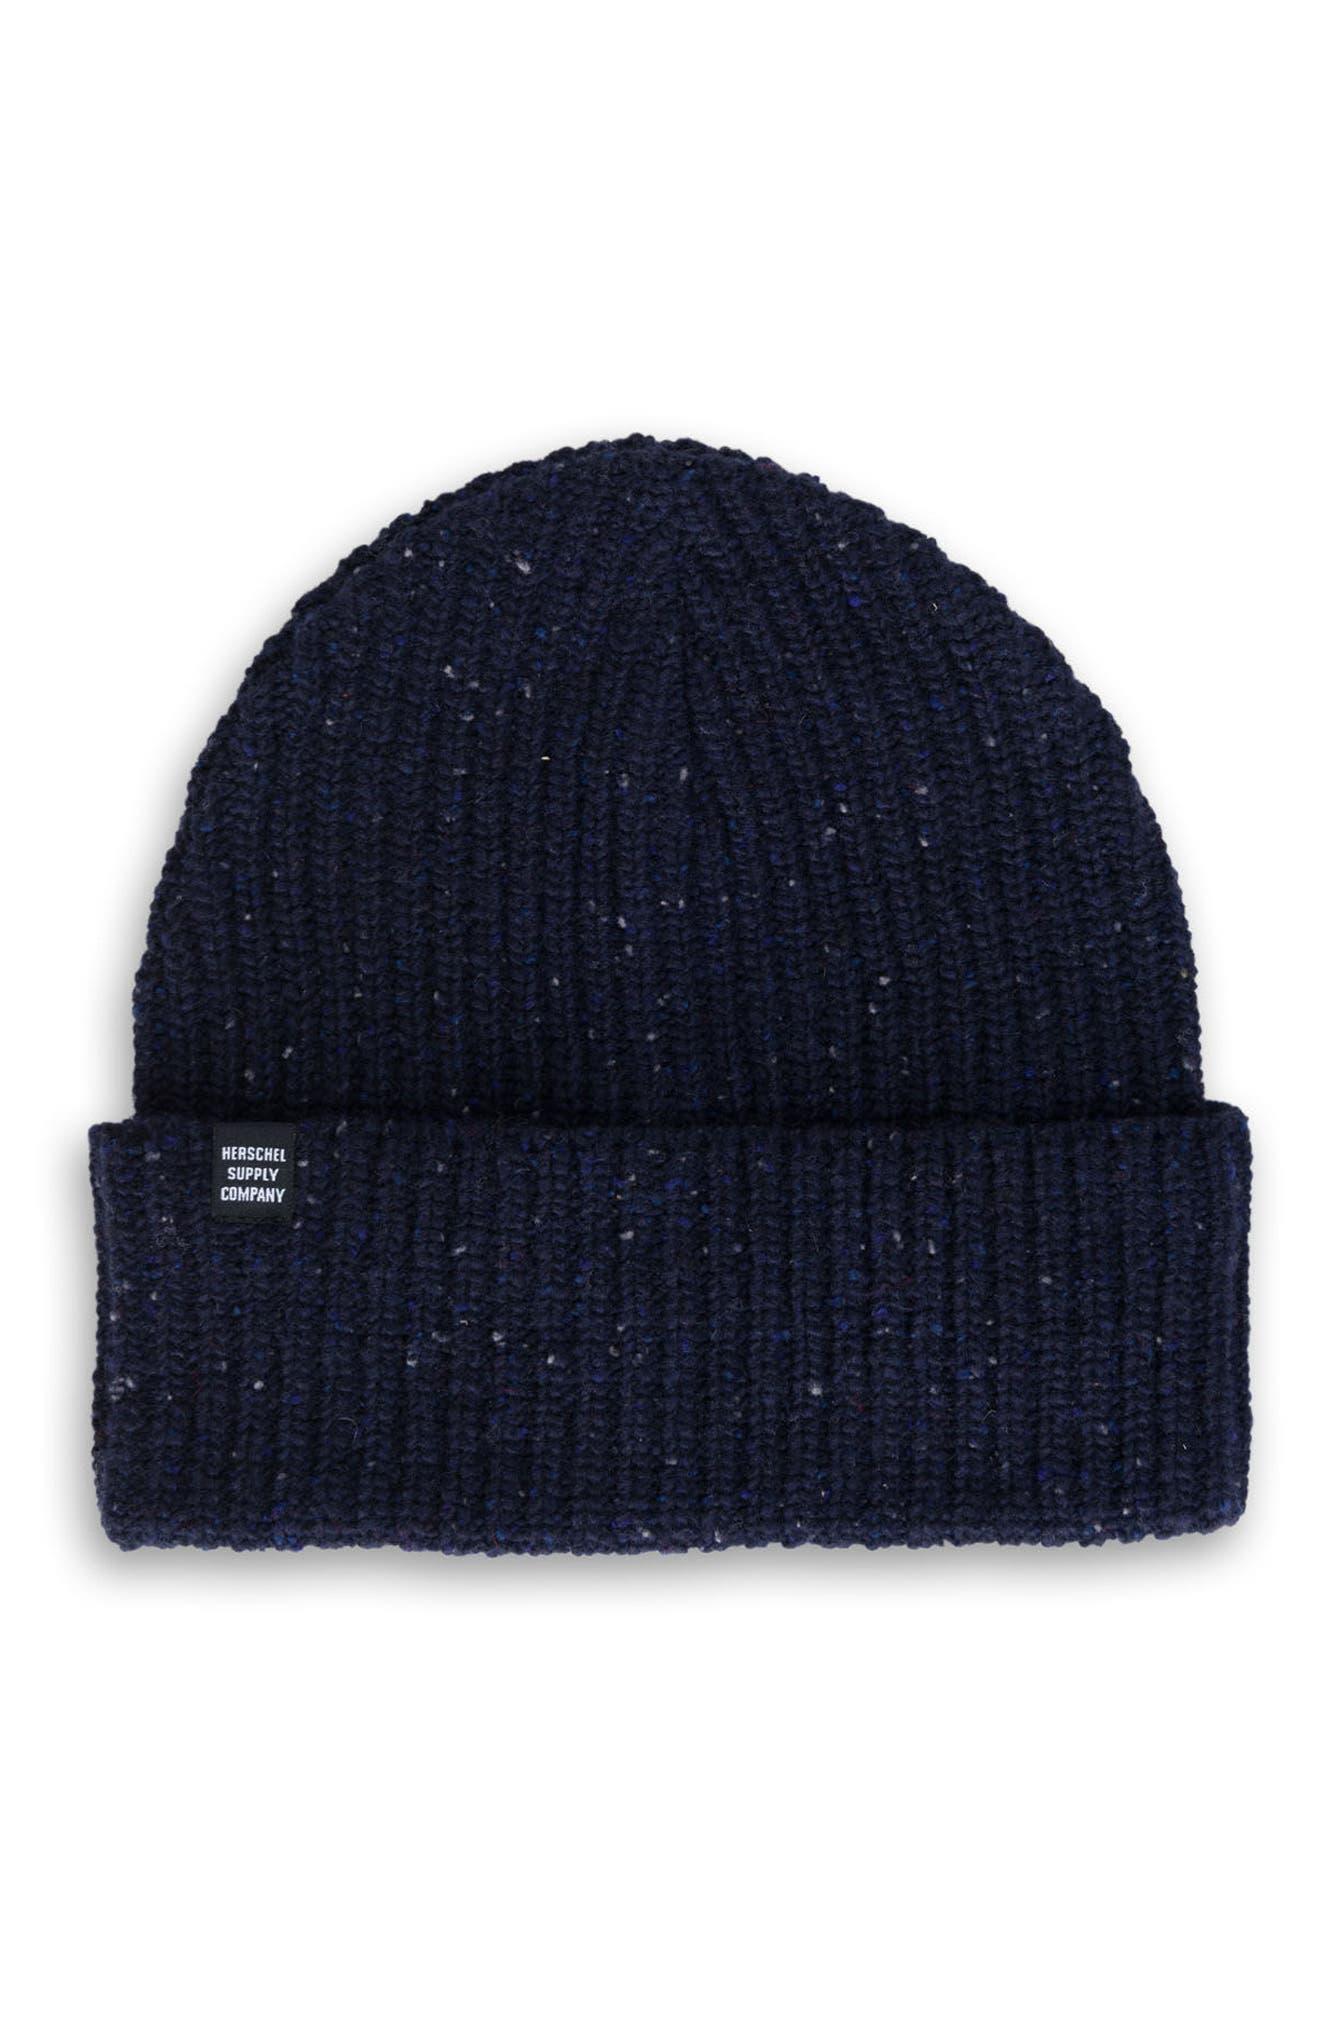 Herschel Supply Co. Quartz Knit Cap